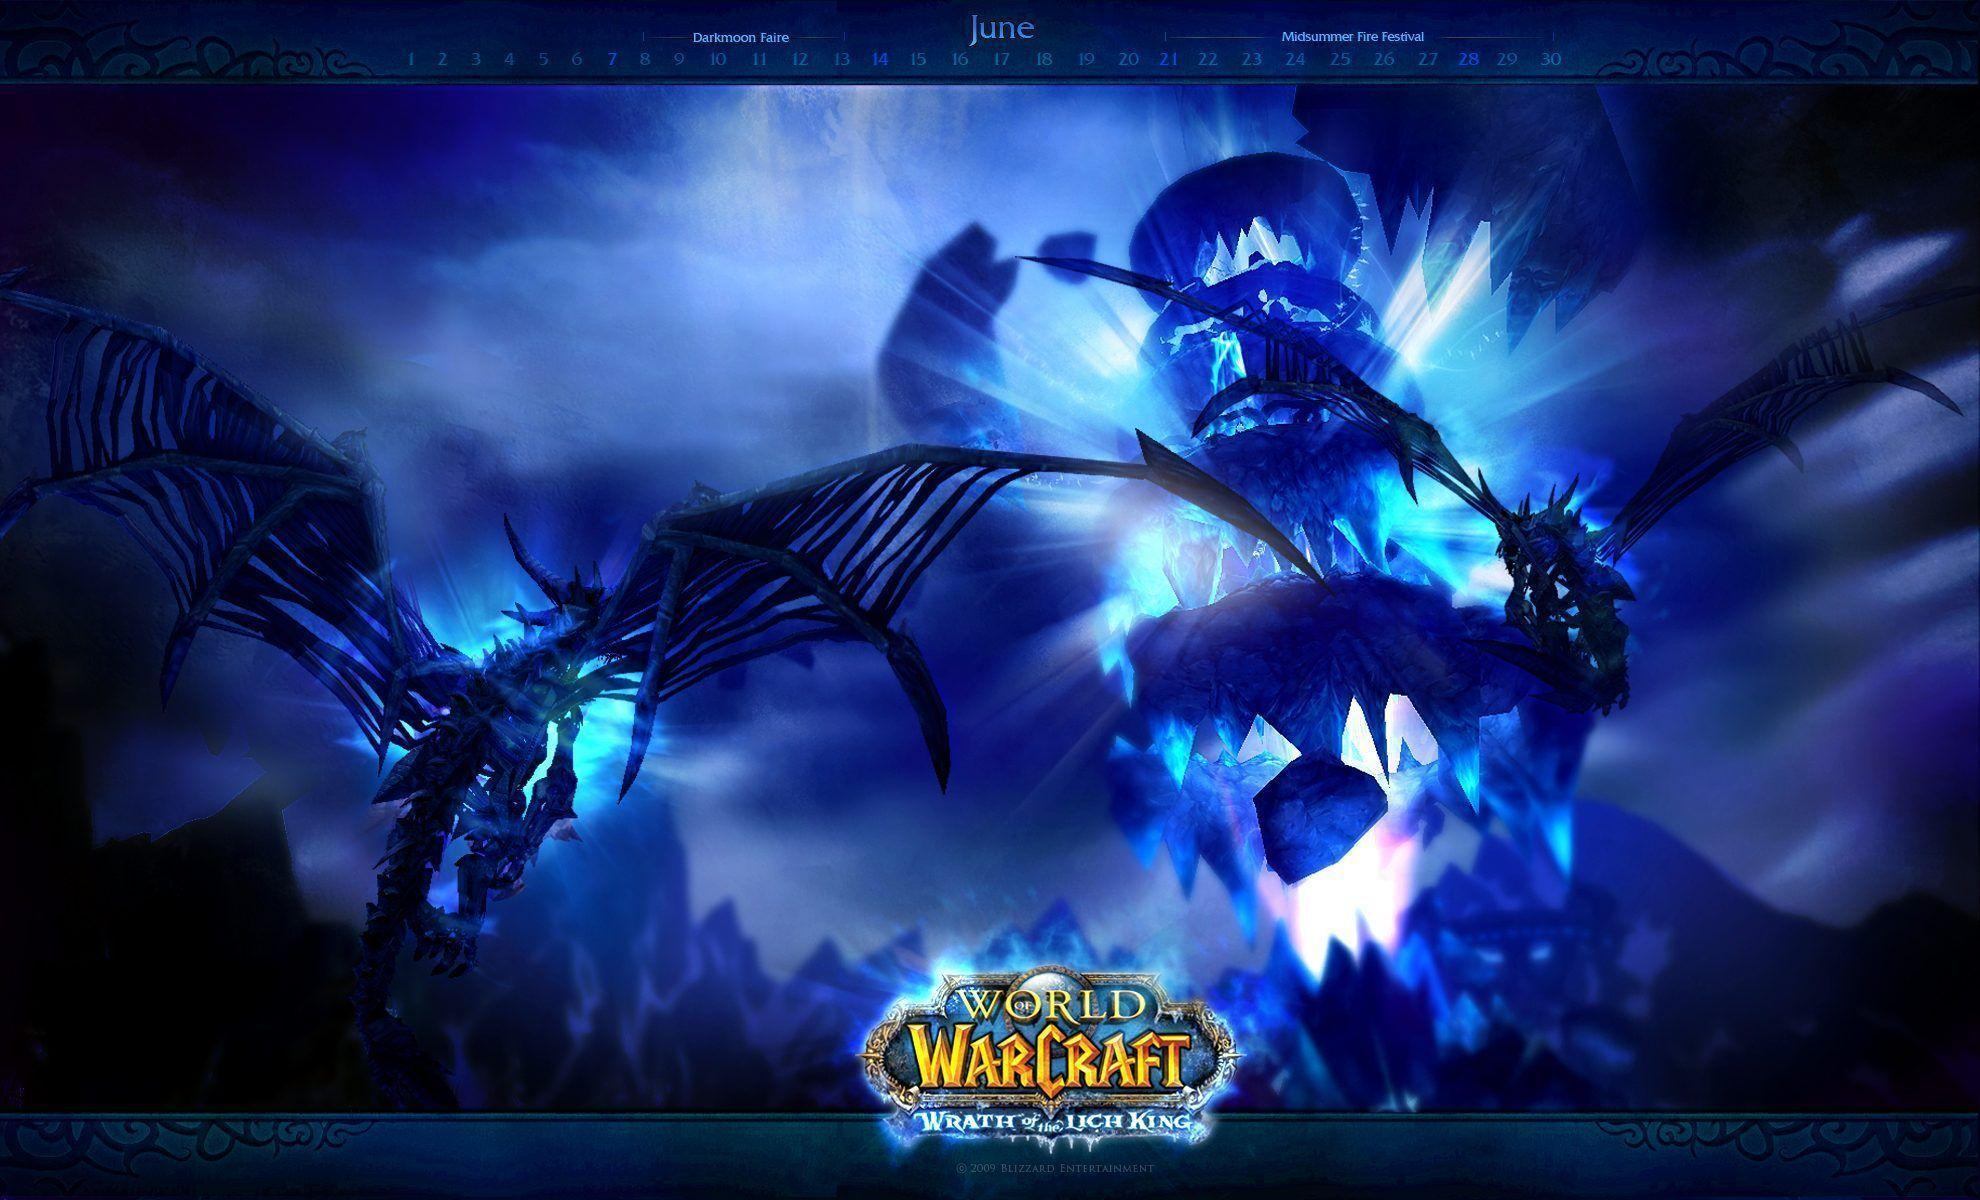 World Of Warcraft Wallpaper 1980x1200